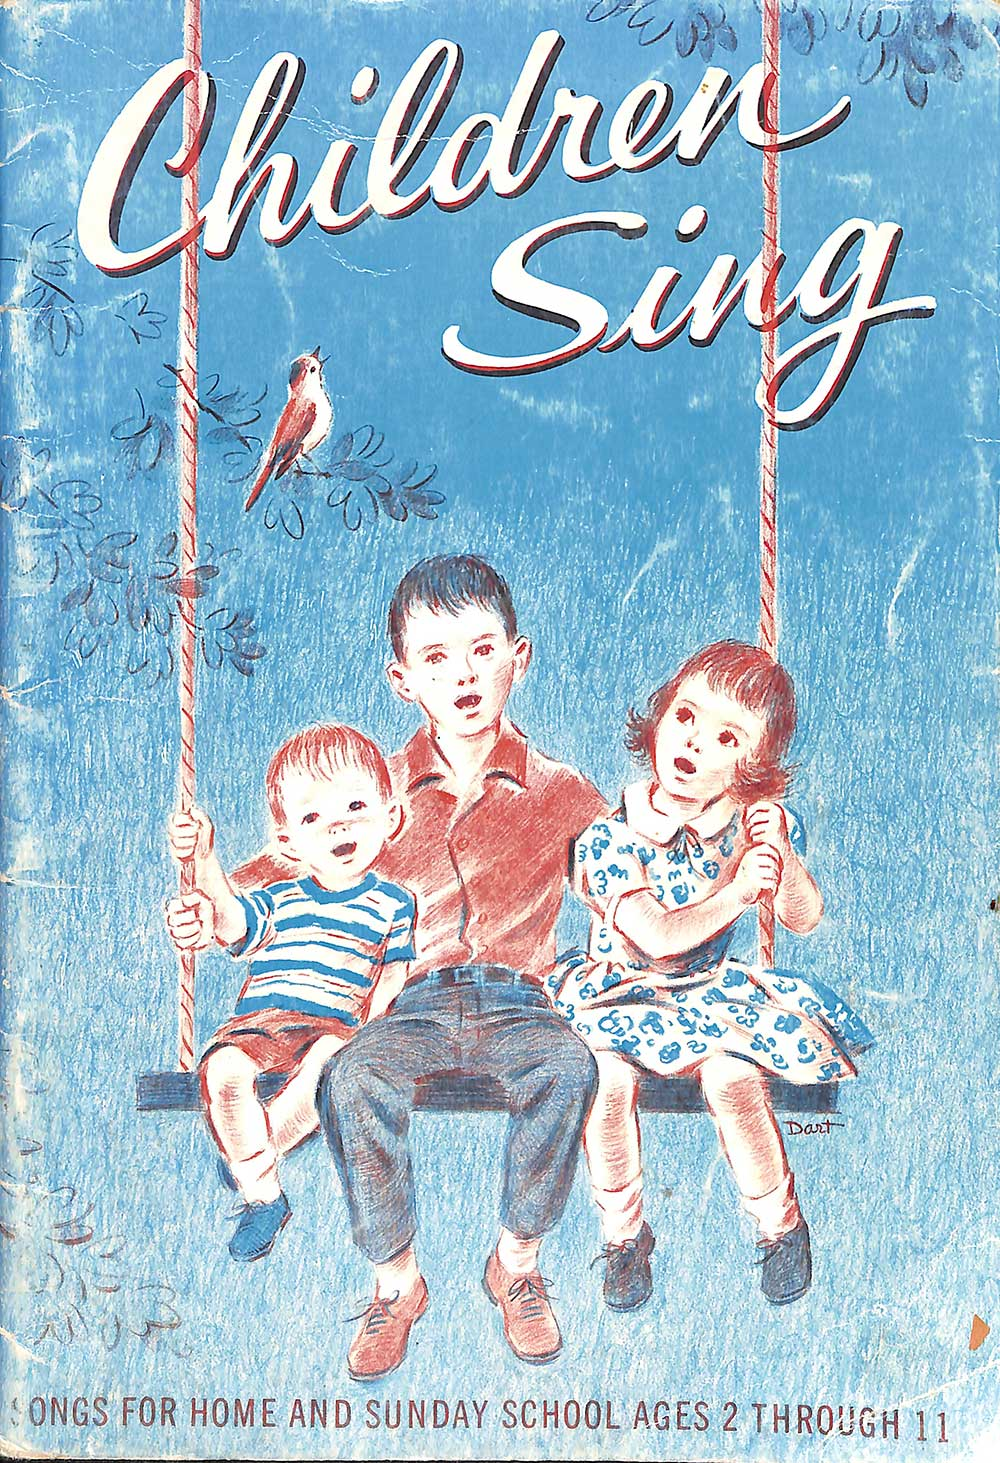 <em>Children sing: Christian songs for boys and girls.</em> Elgin, Illinois: David C. Cook Publishing Company, 1962.